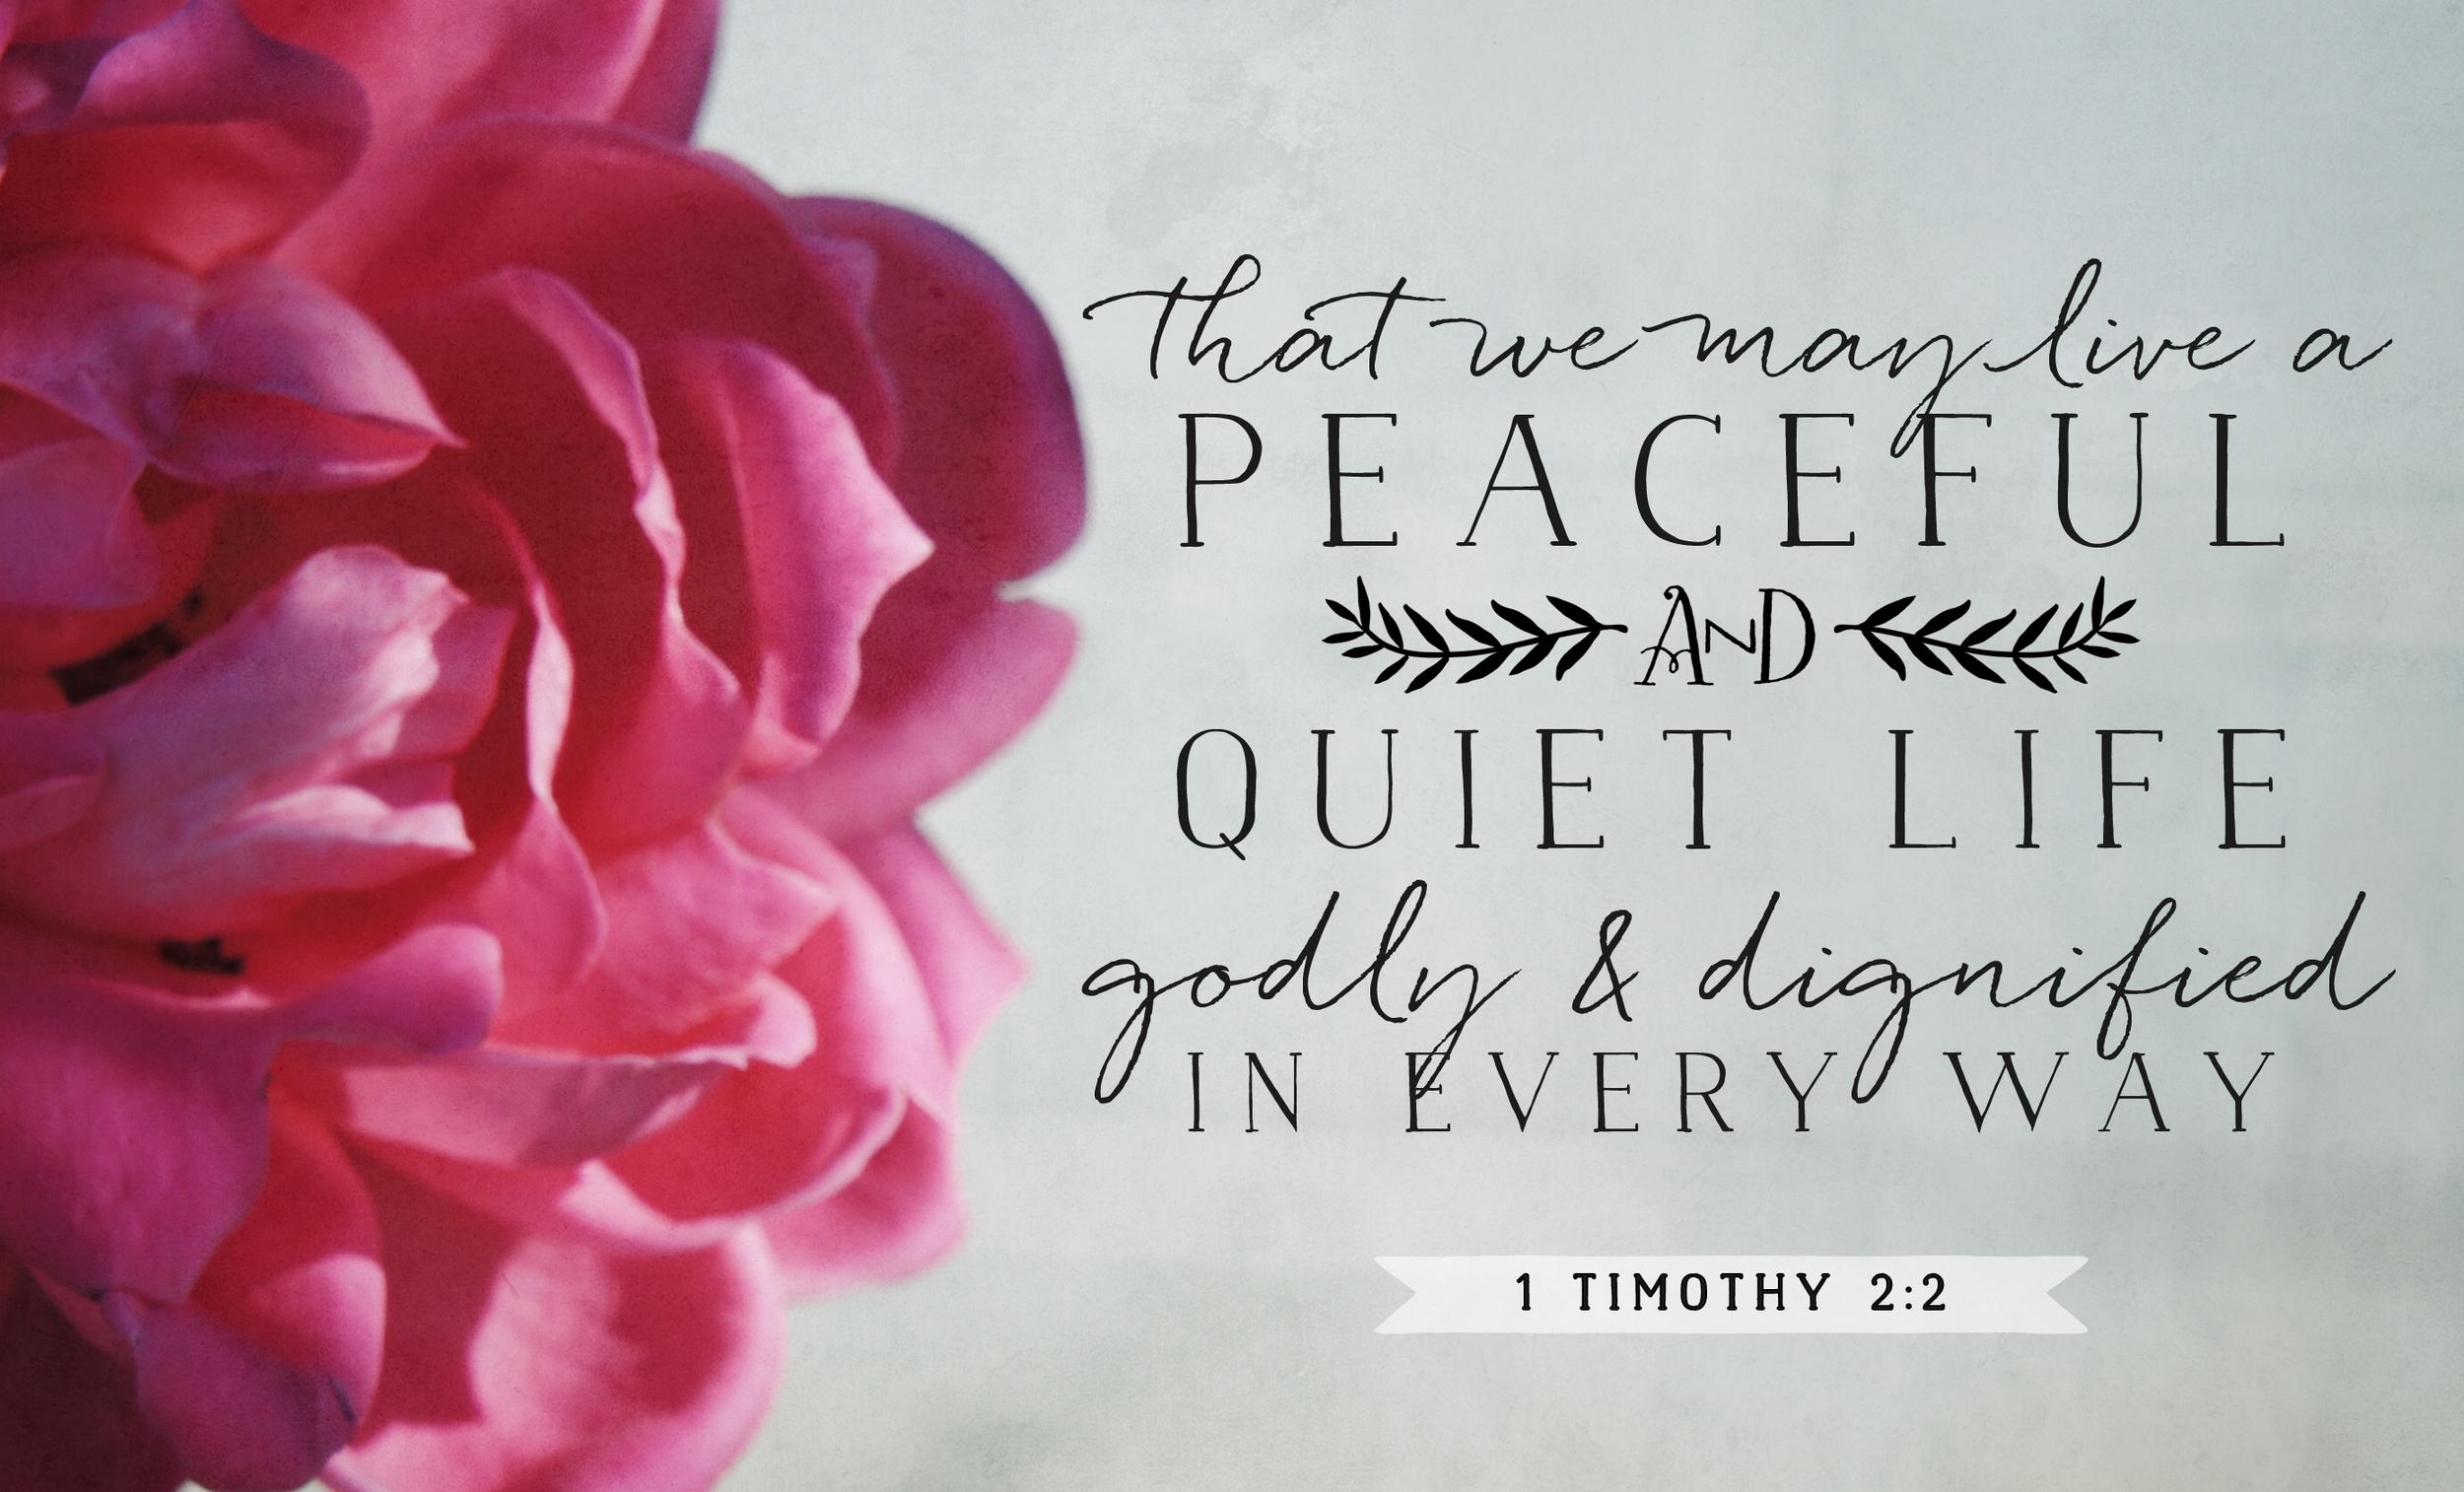 1 Timothy 2:2